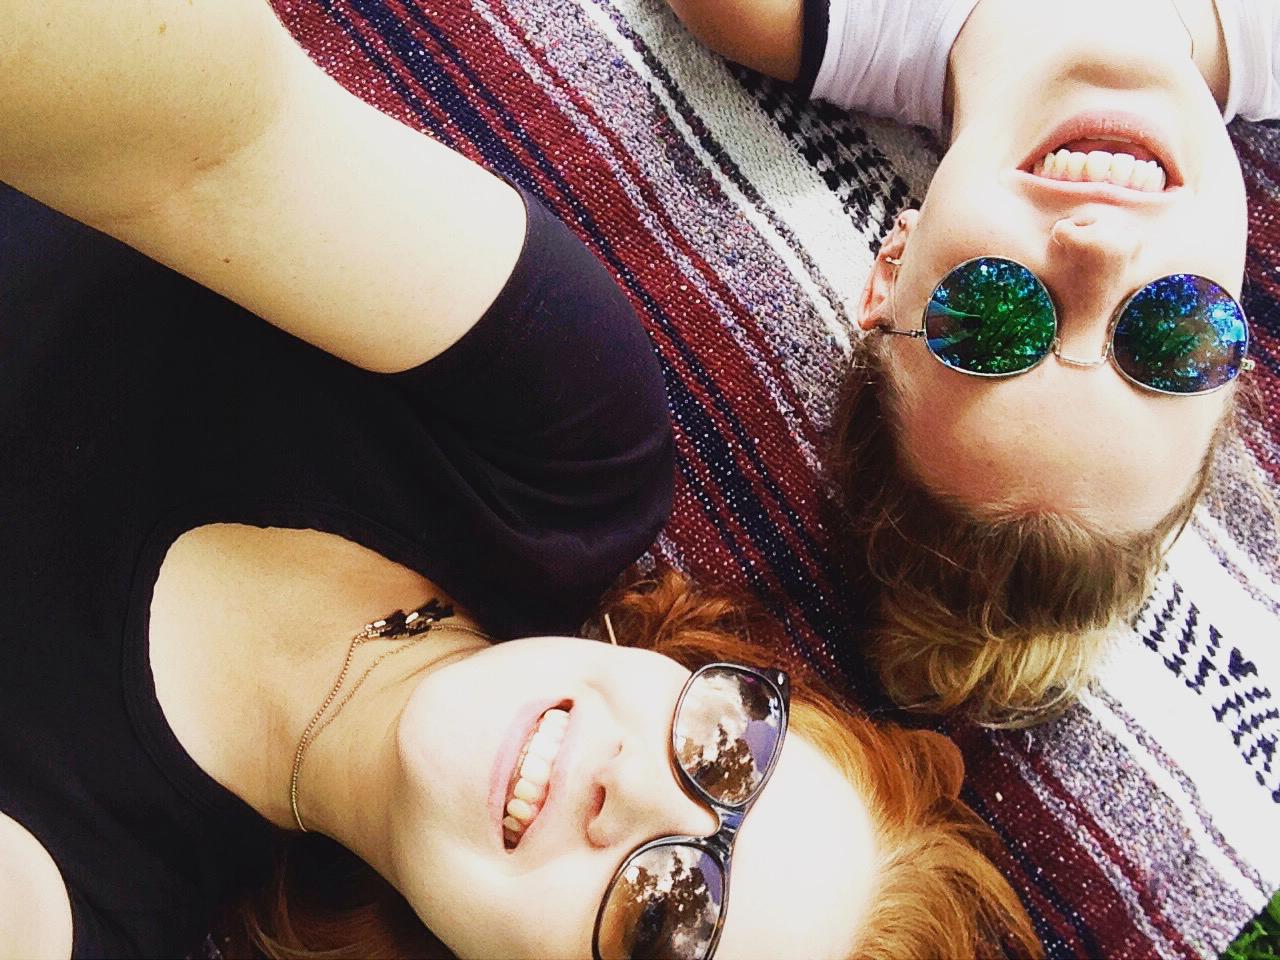 Madeline taking a selfie with her best friend, Michaela.